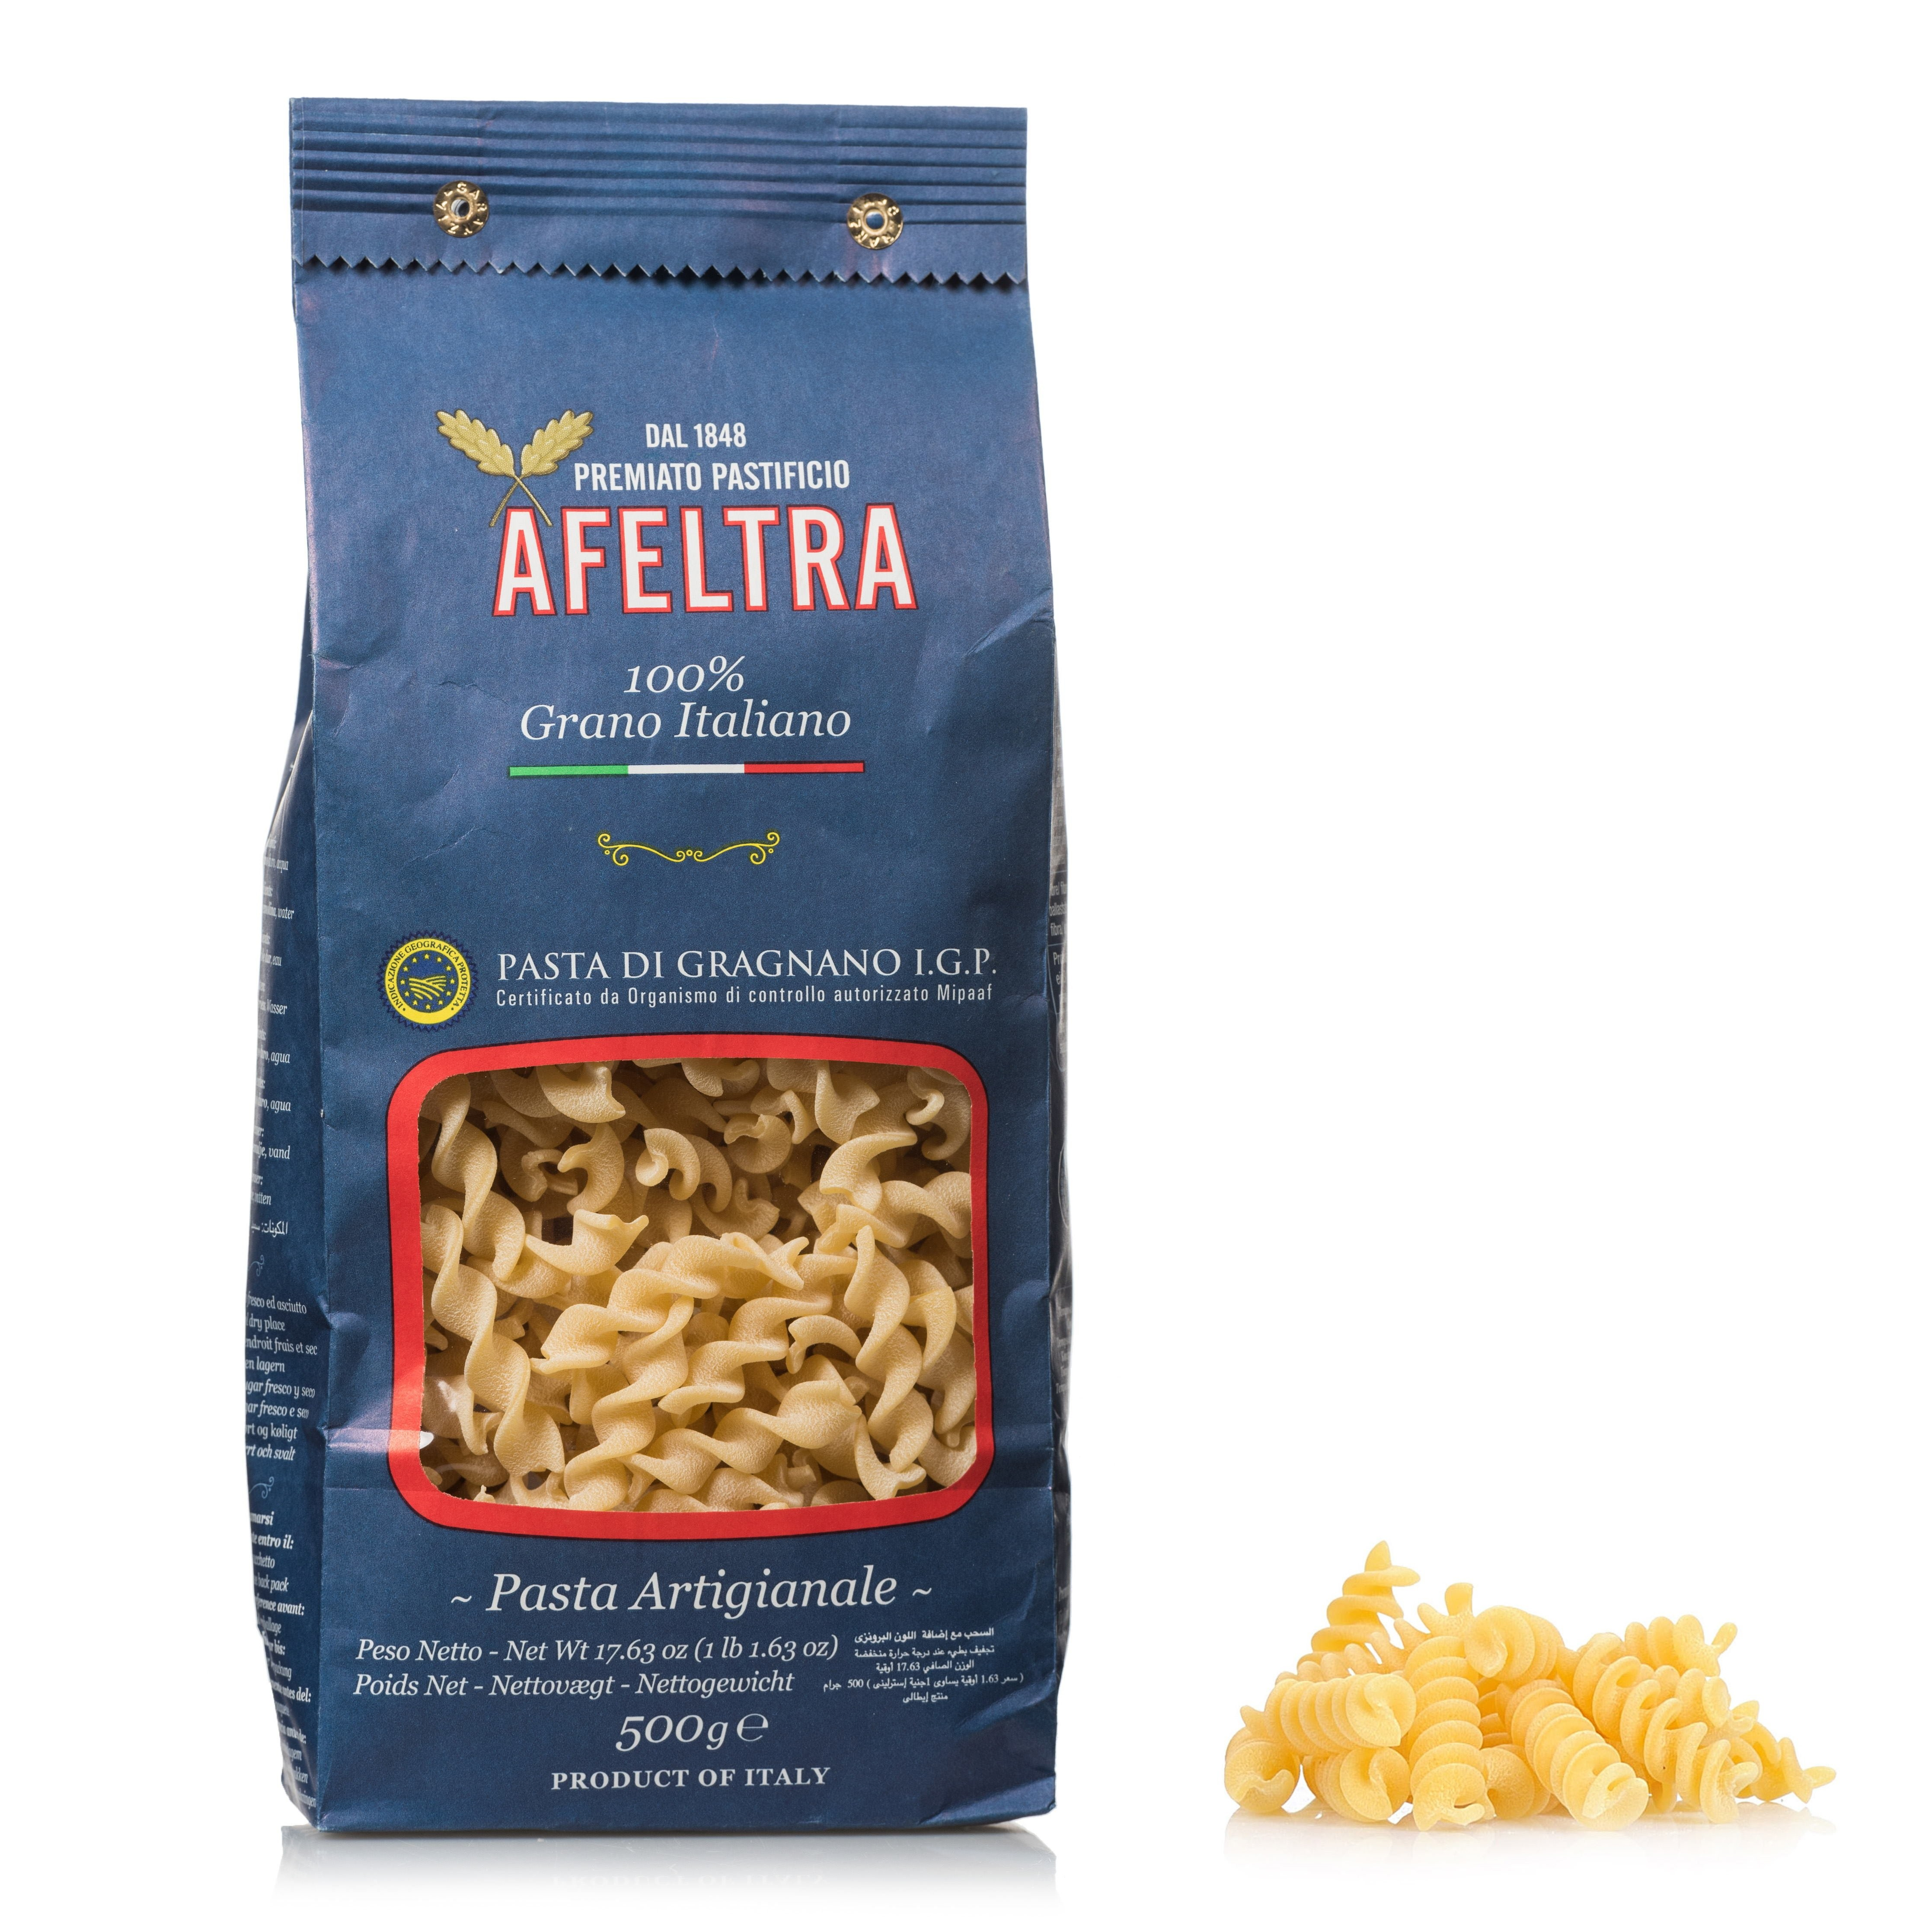 100% Italian Grain Tortiglioni 17.6 oz